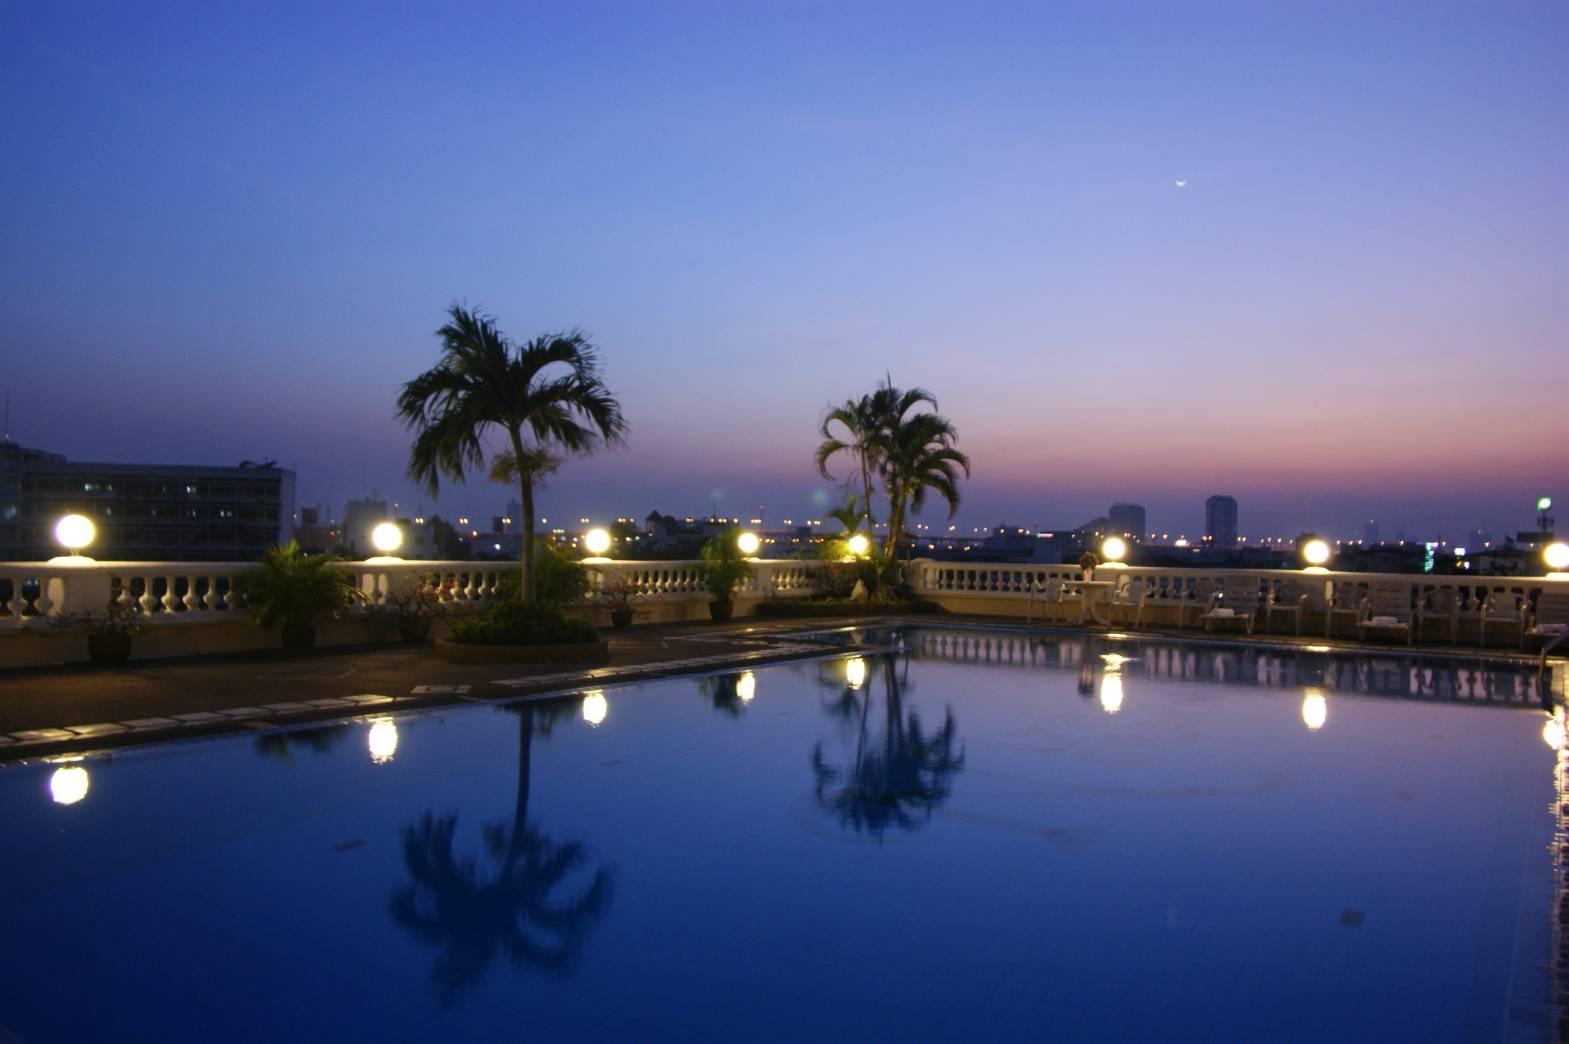 The Niran Grand Hotel